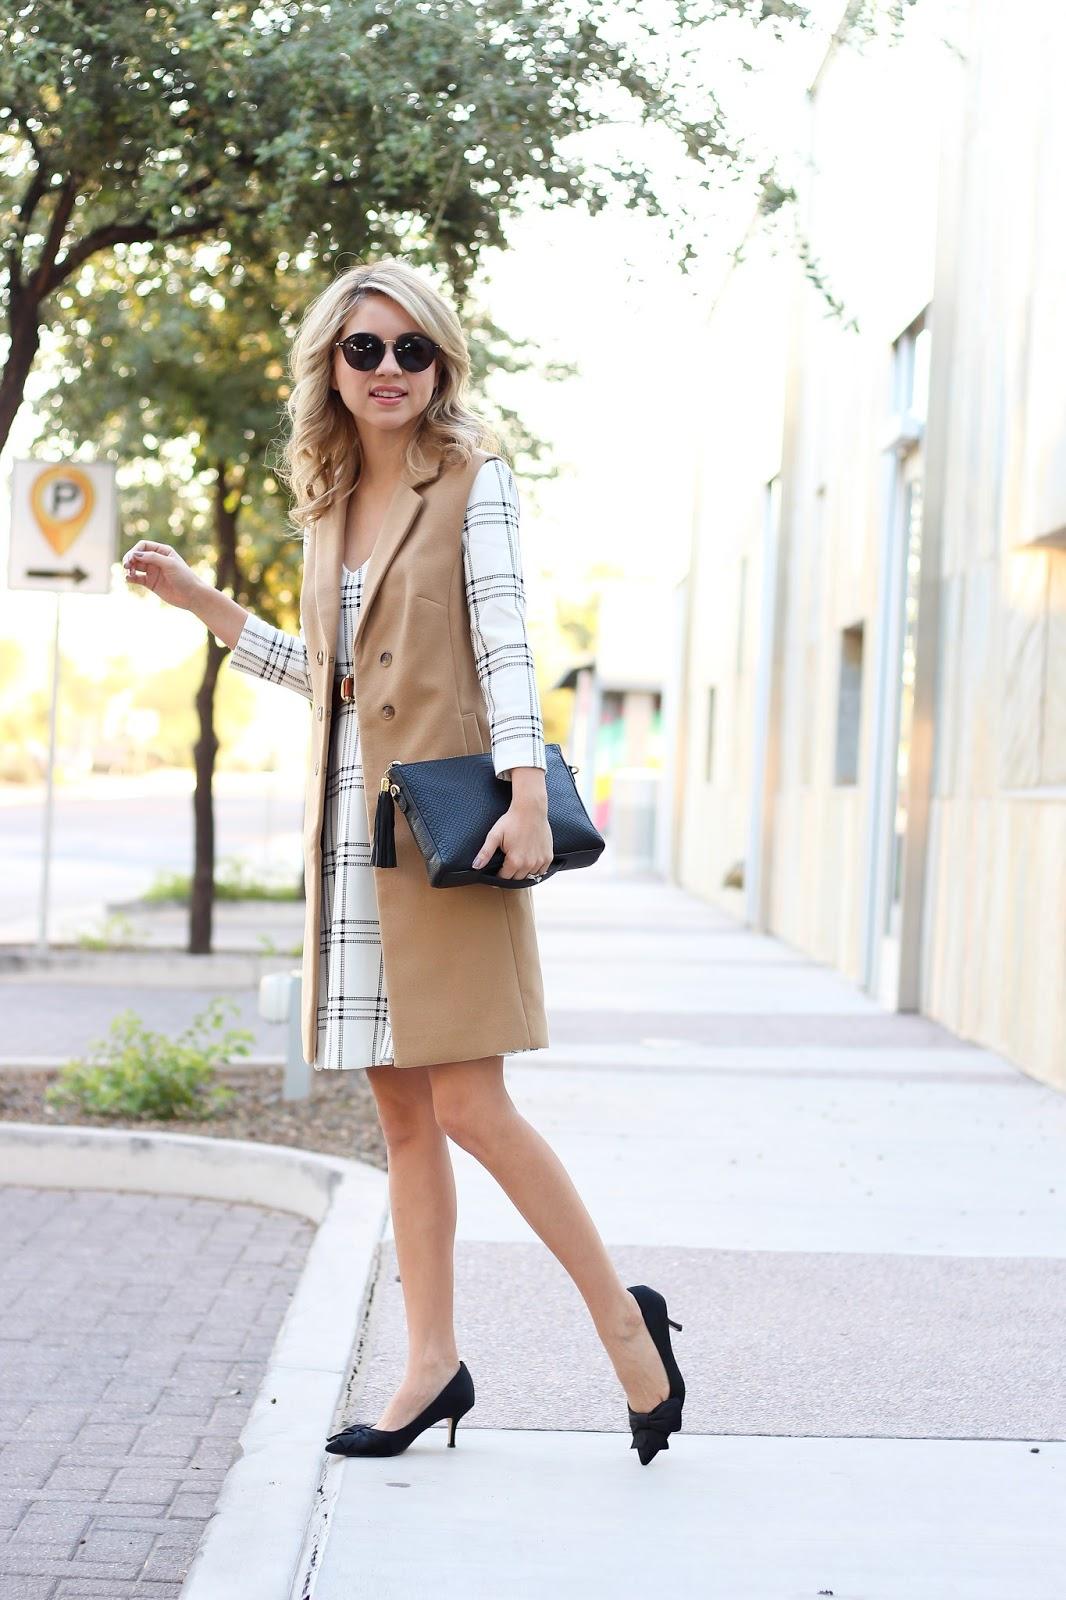 How to elevate your plaid dress - maison jules dress - maison jules vest - macs - blogger style - street style